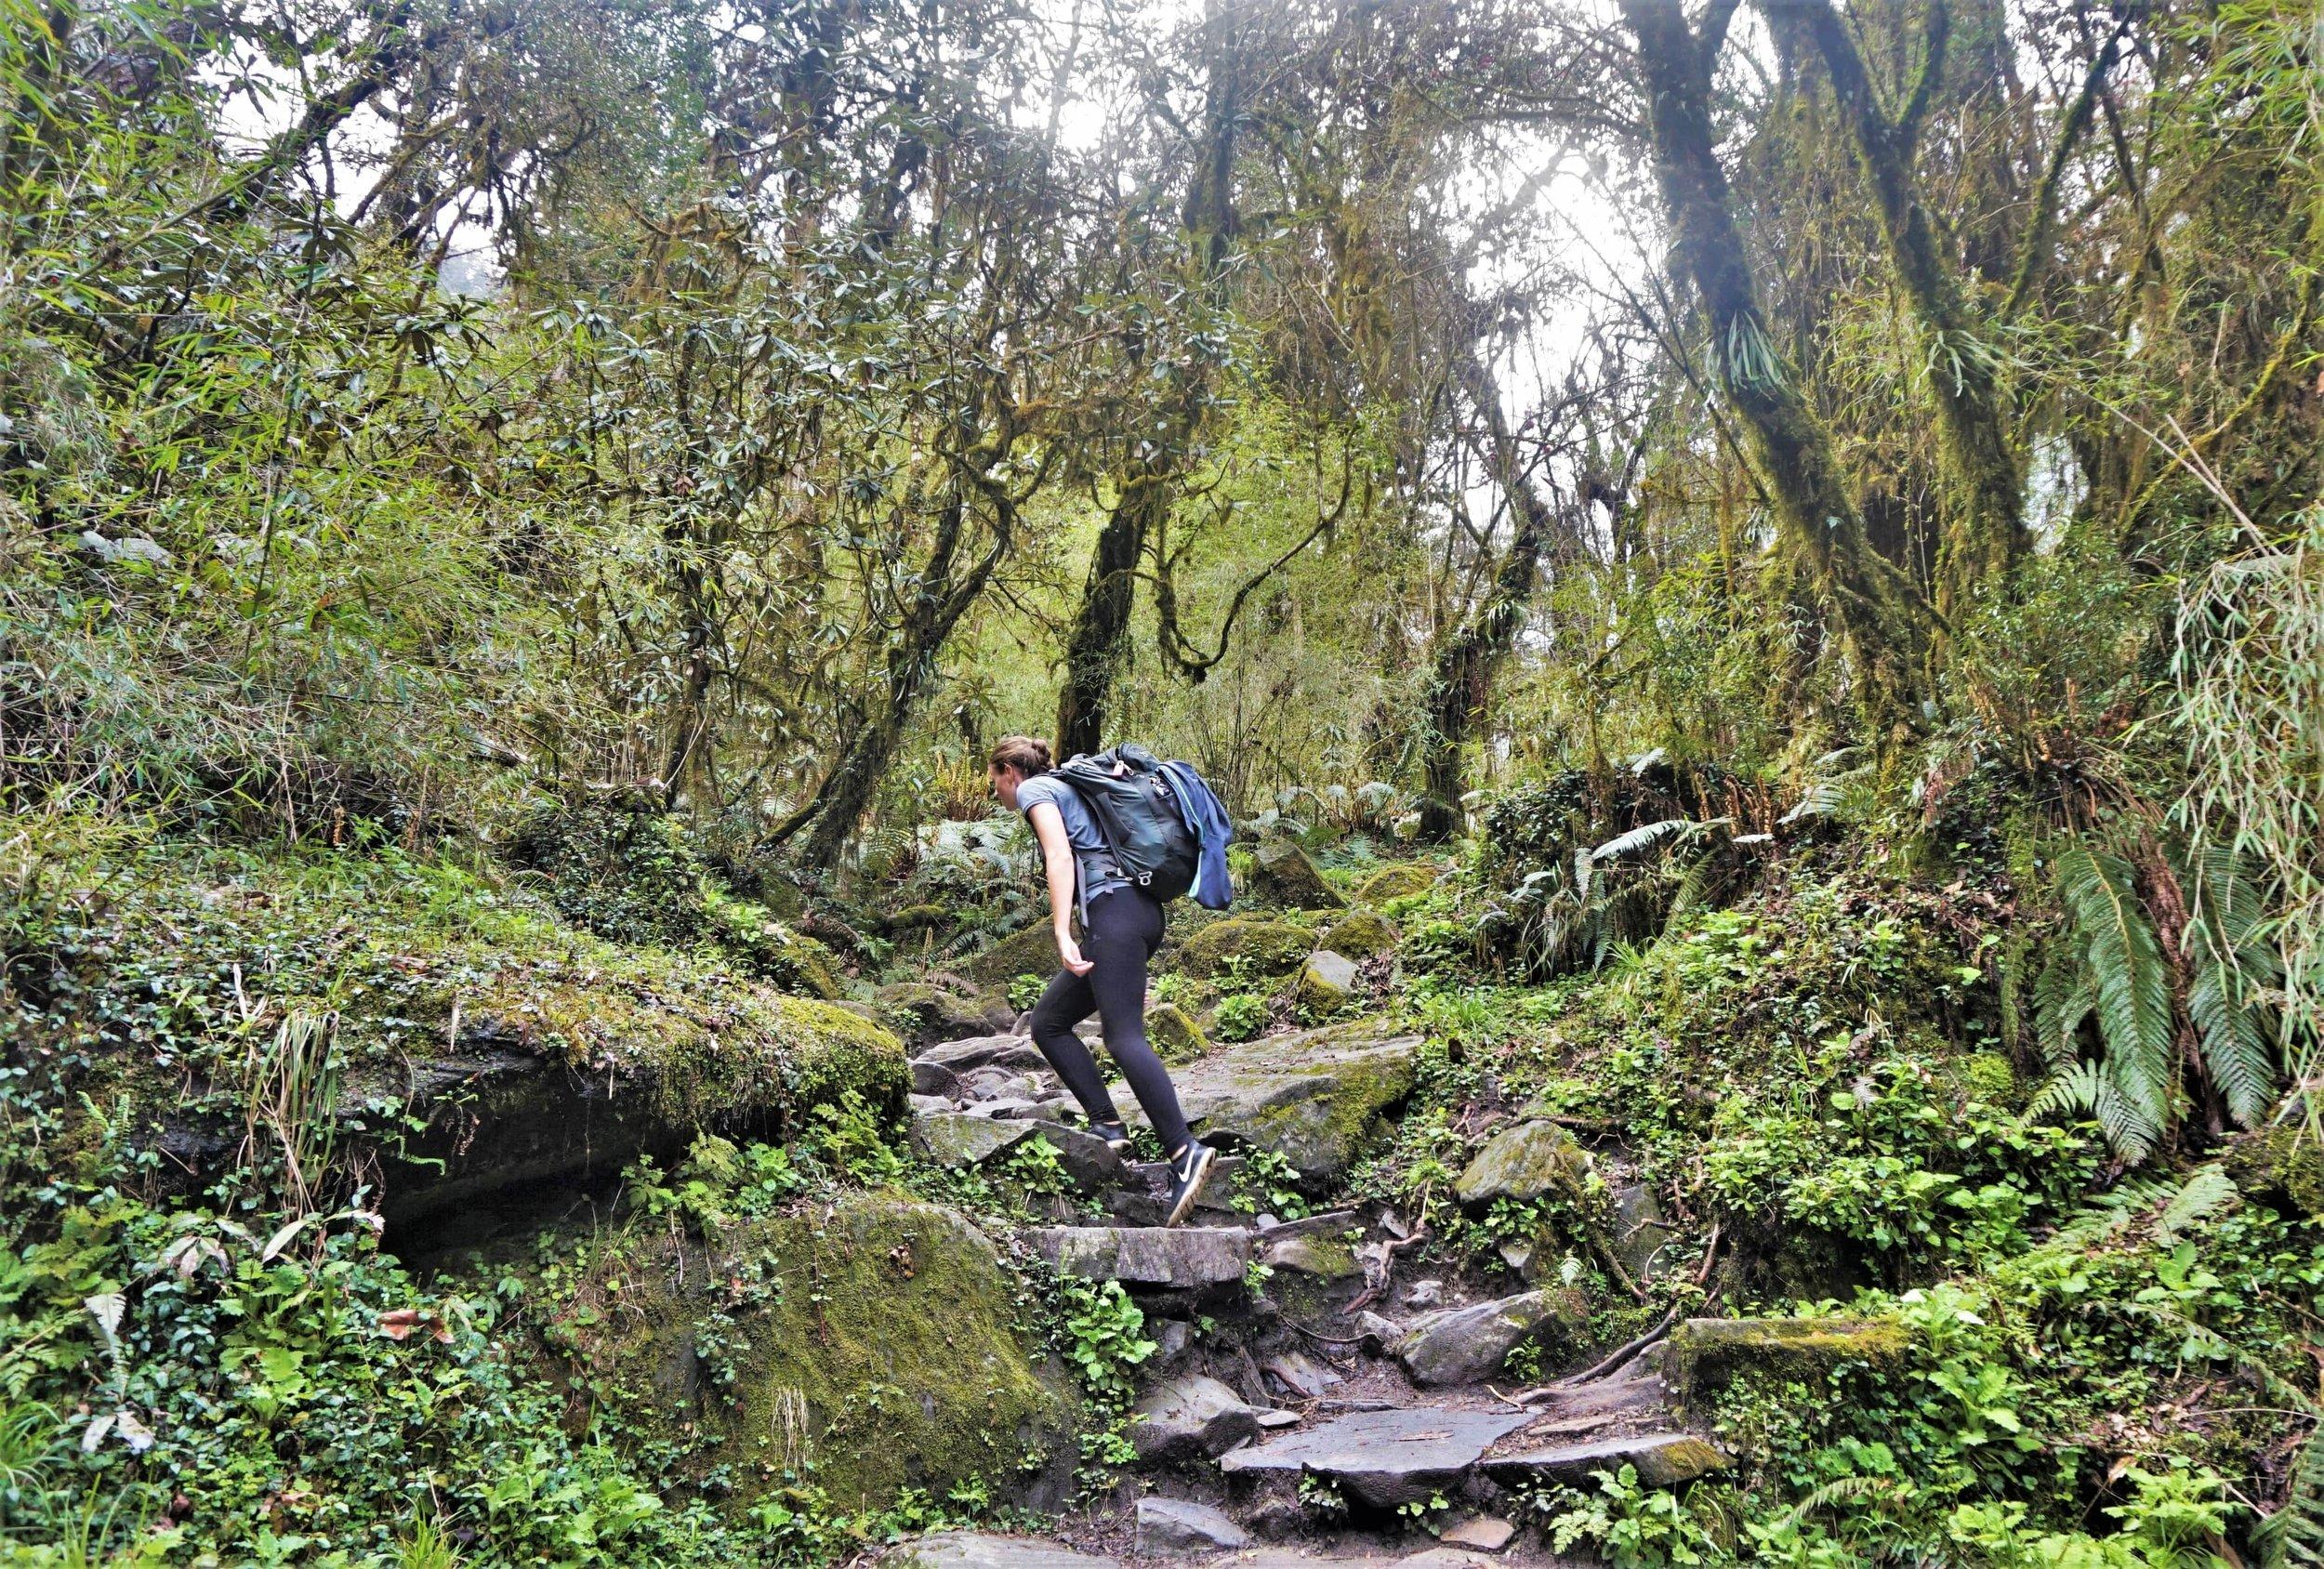 Amazing lush vegetation at the beginning of the Annapurna trek